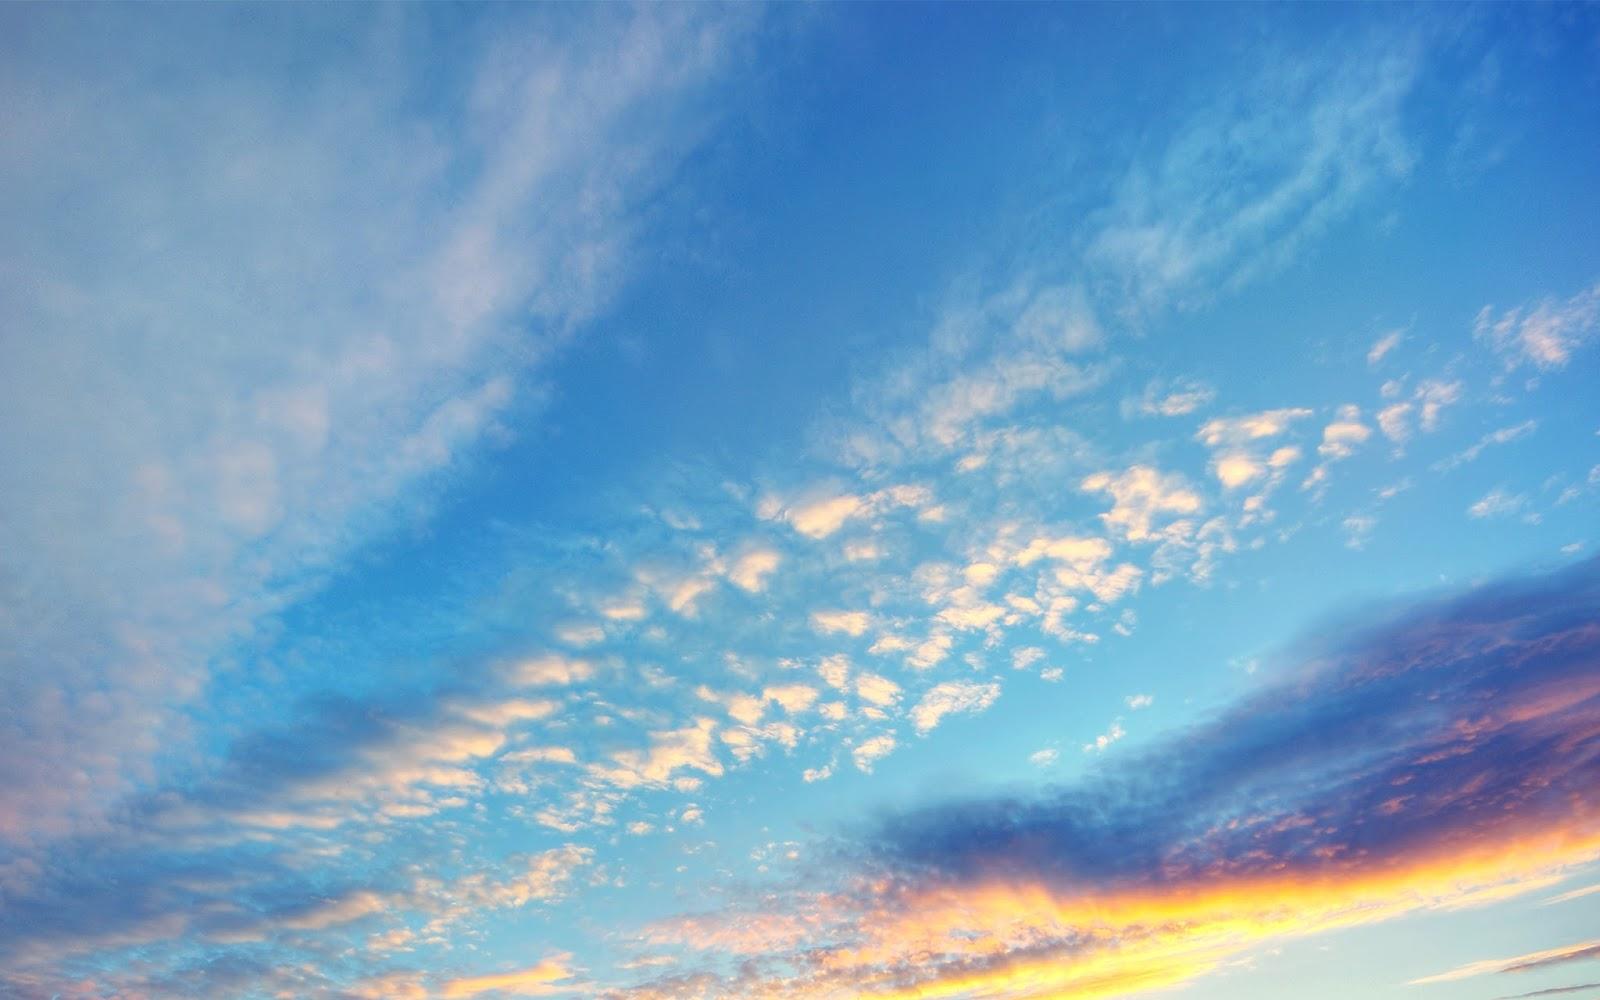 Evening sunset sky clouds 2560x1600 - 105年指考結束,準備好一起迎接妖精的號角的回歸了嗎!